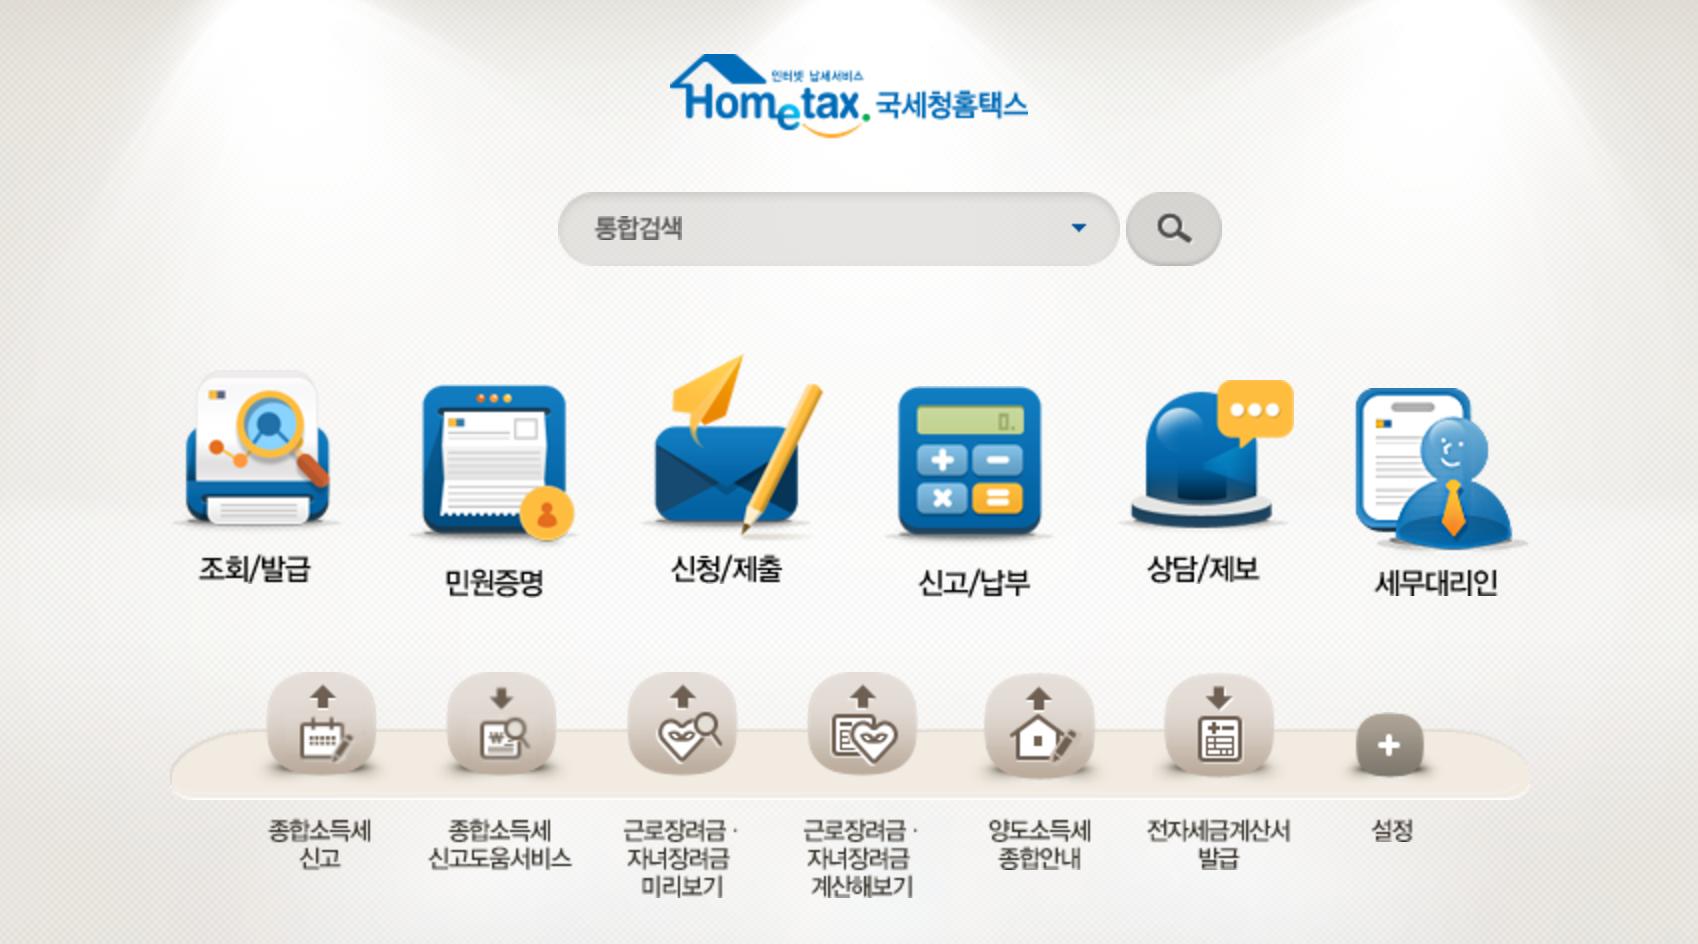 Hometax Main